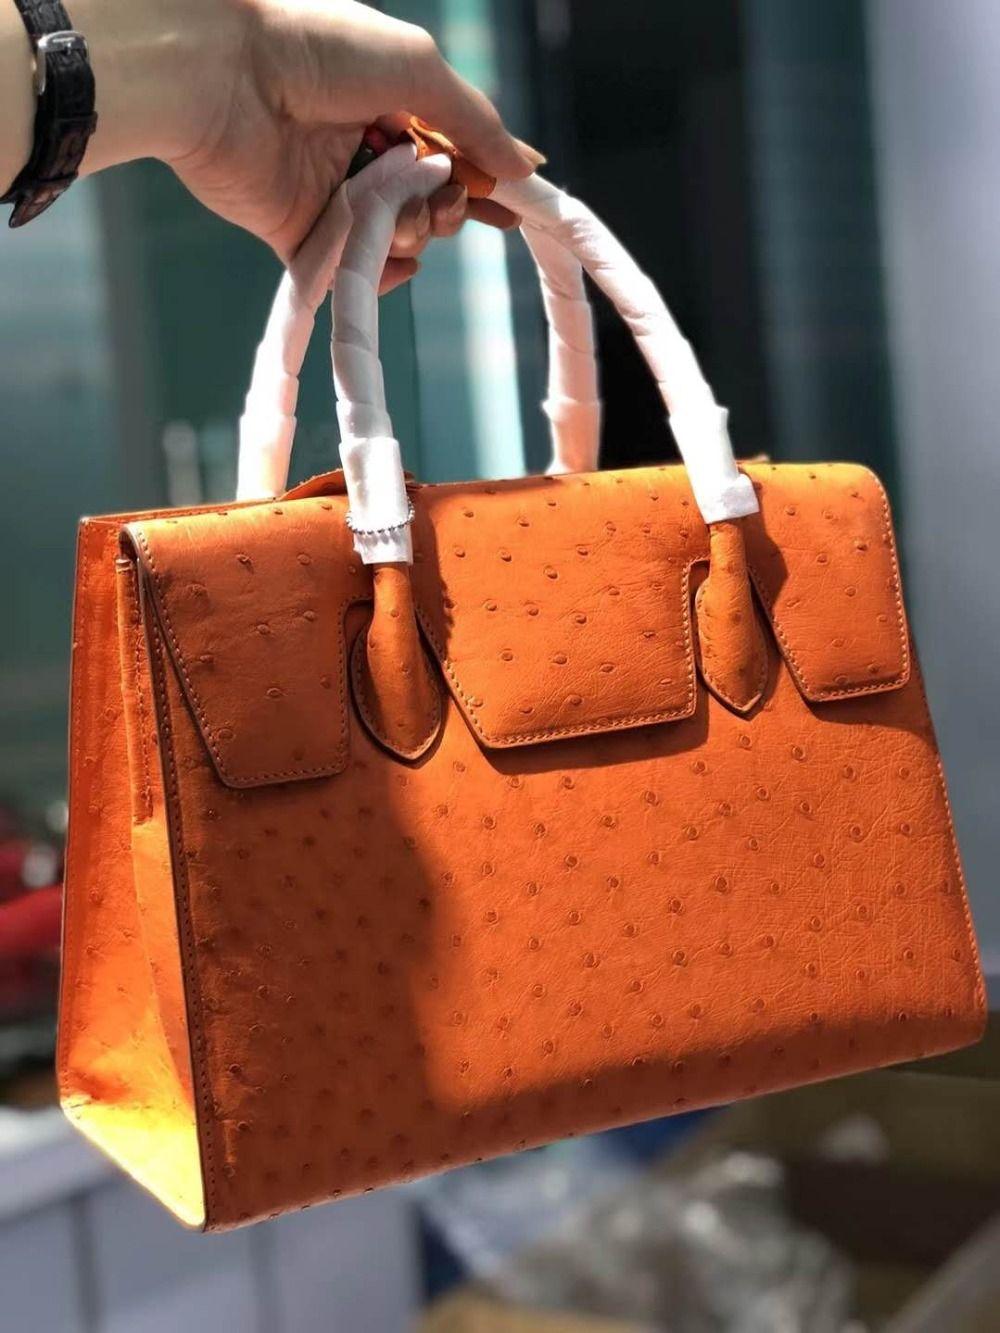 100% echtes real ostrich haut frauen tote tasche top level qualität full grain Ostrich haut frauen tote handtasche orange lila rosa